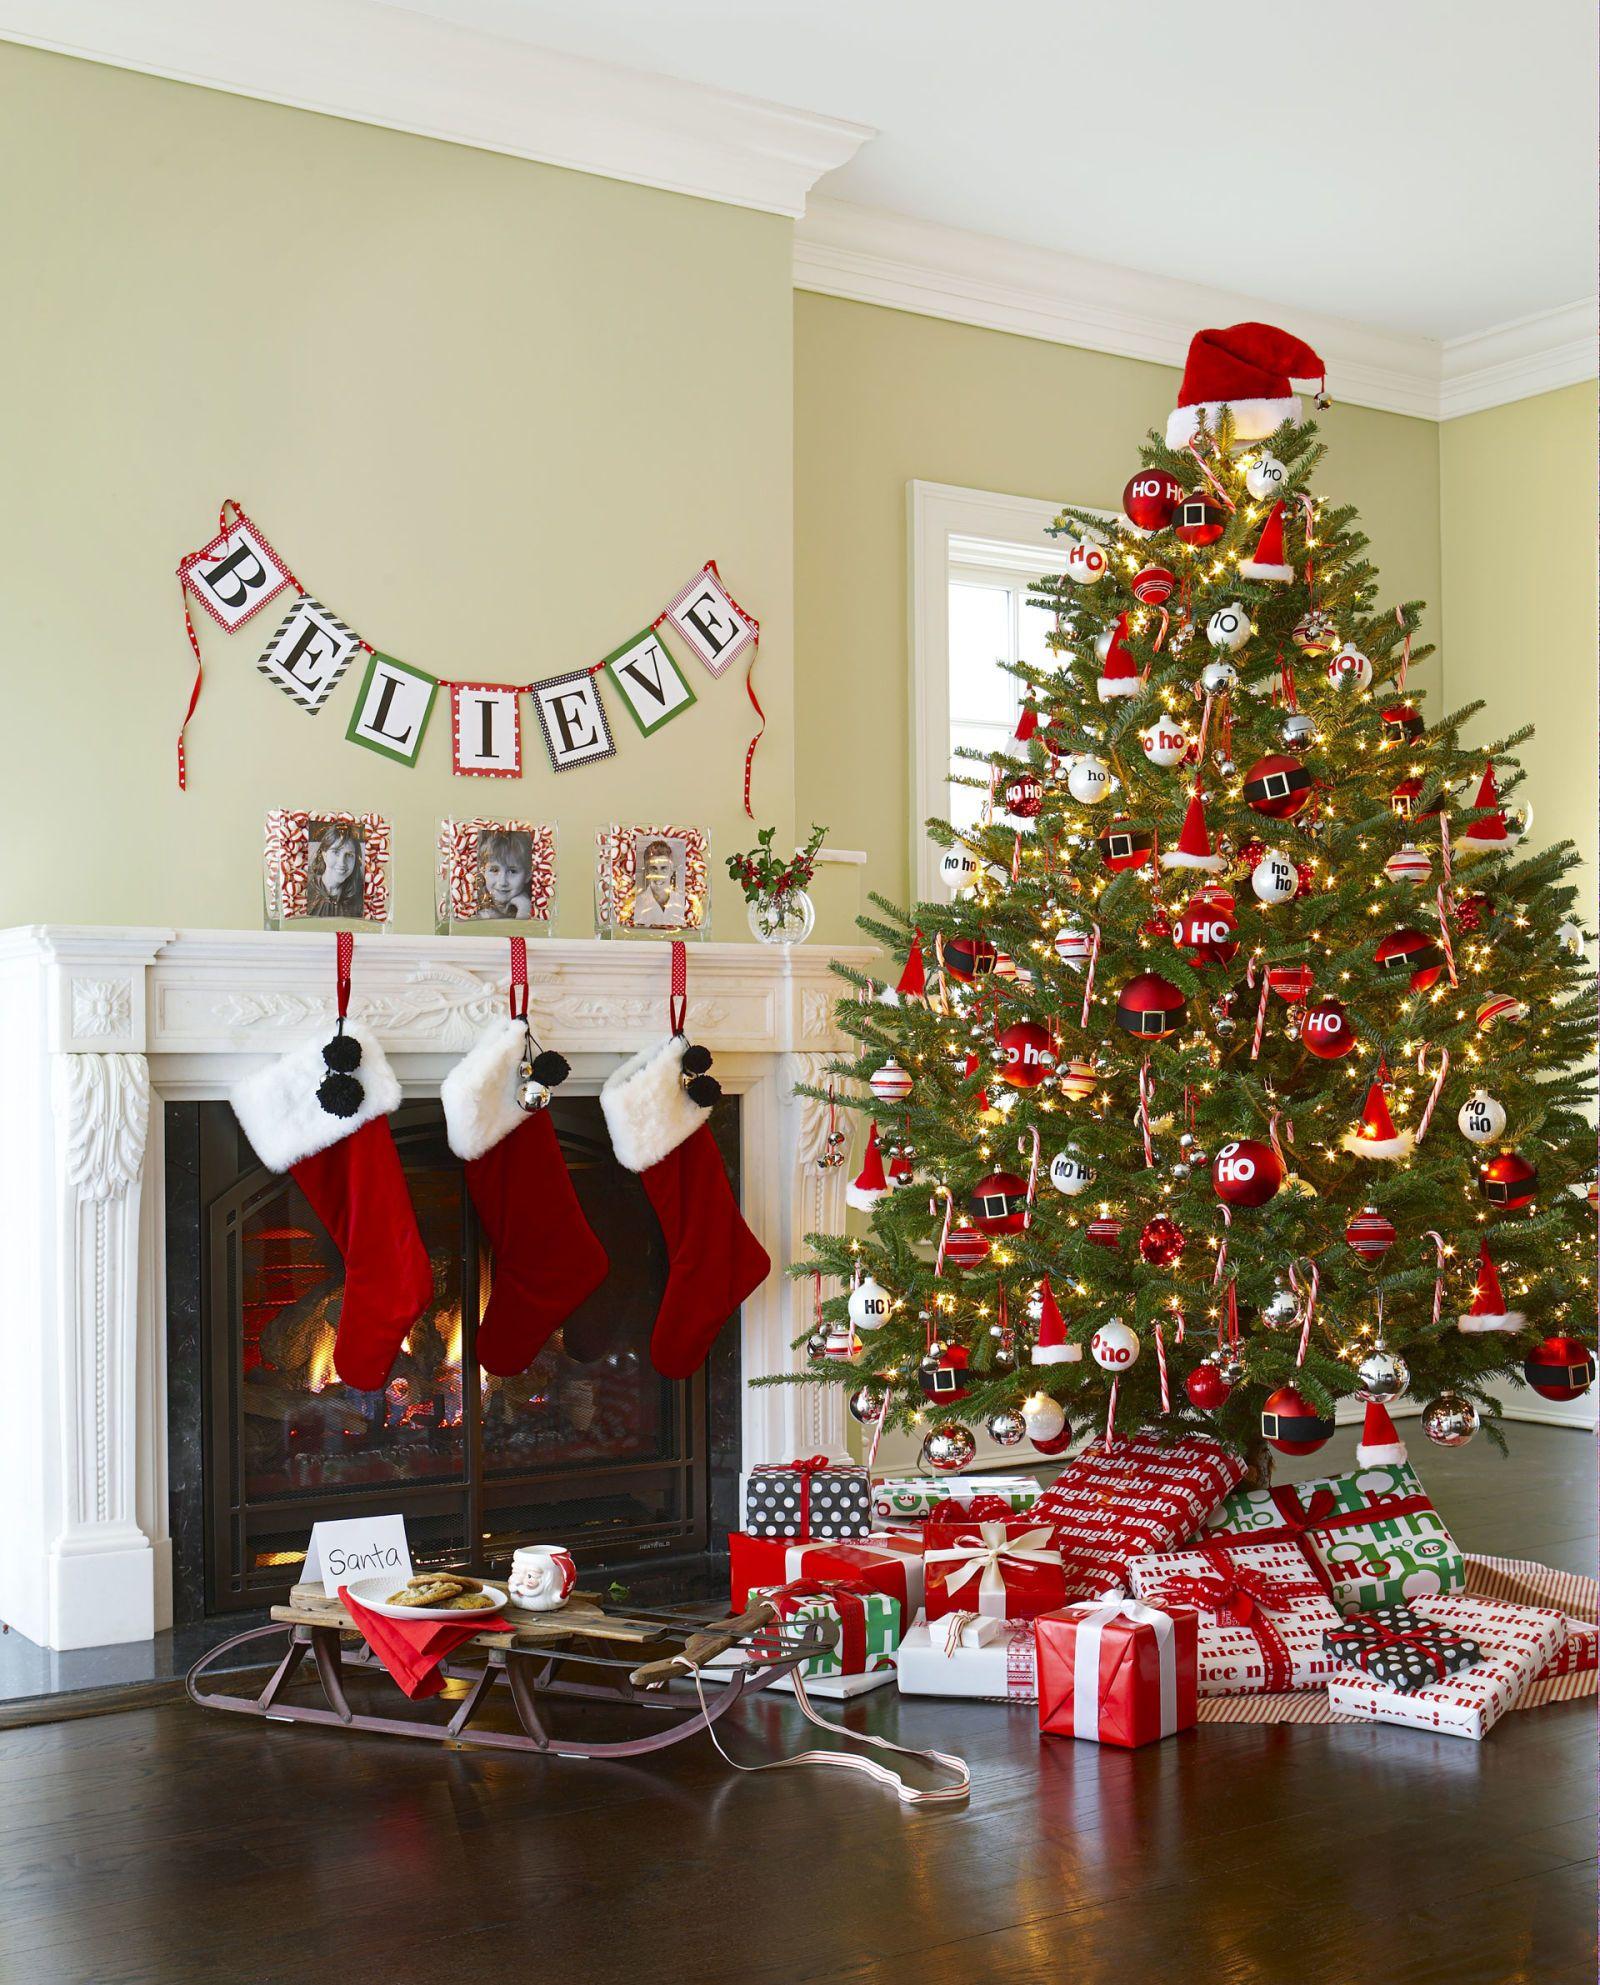 100+ Best Christmas Ideas for 2018 , Holiday DIY, Decor